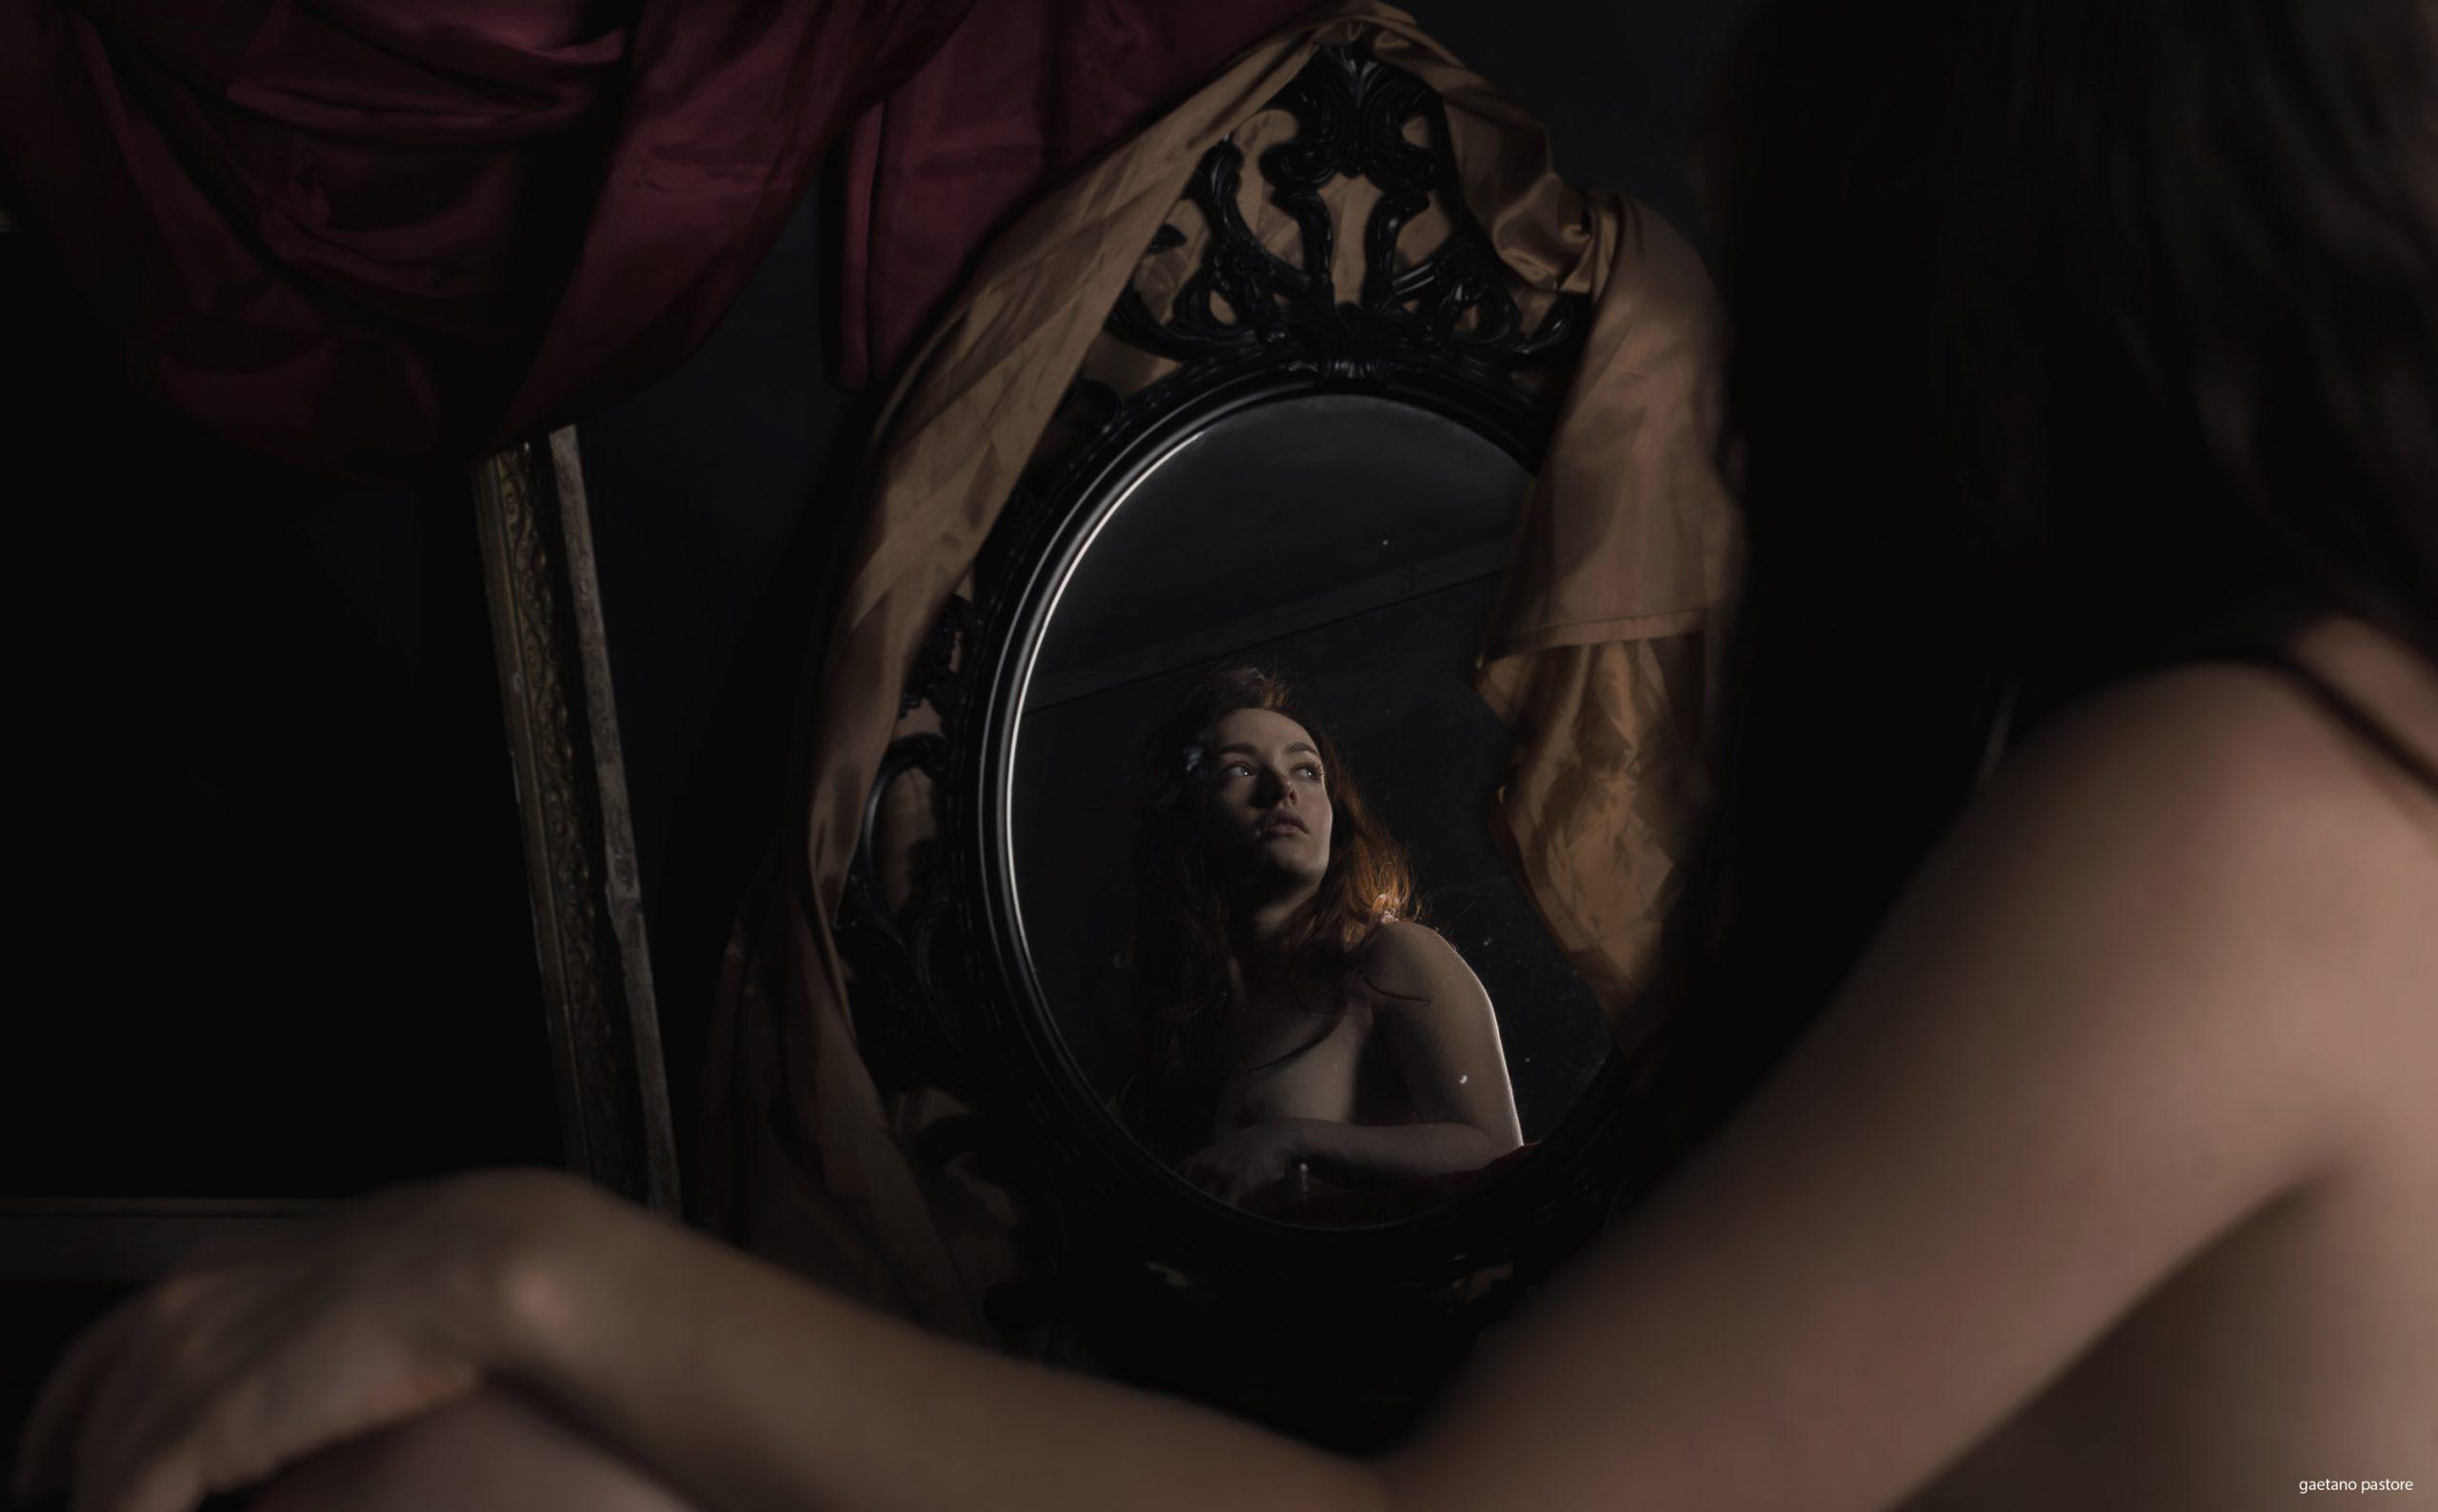 Categorie: Boudoir & Nude, Fine Art, Portrait: GAETANO PASTORE - Model: FEDERICA ZONGOLI - Location: Roma, RM, Italia